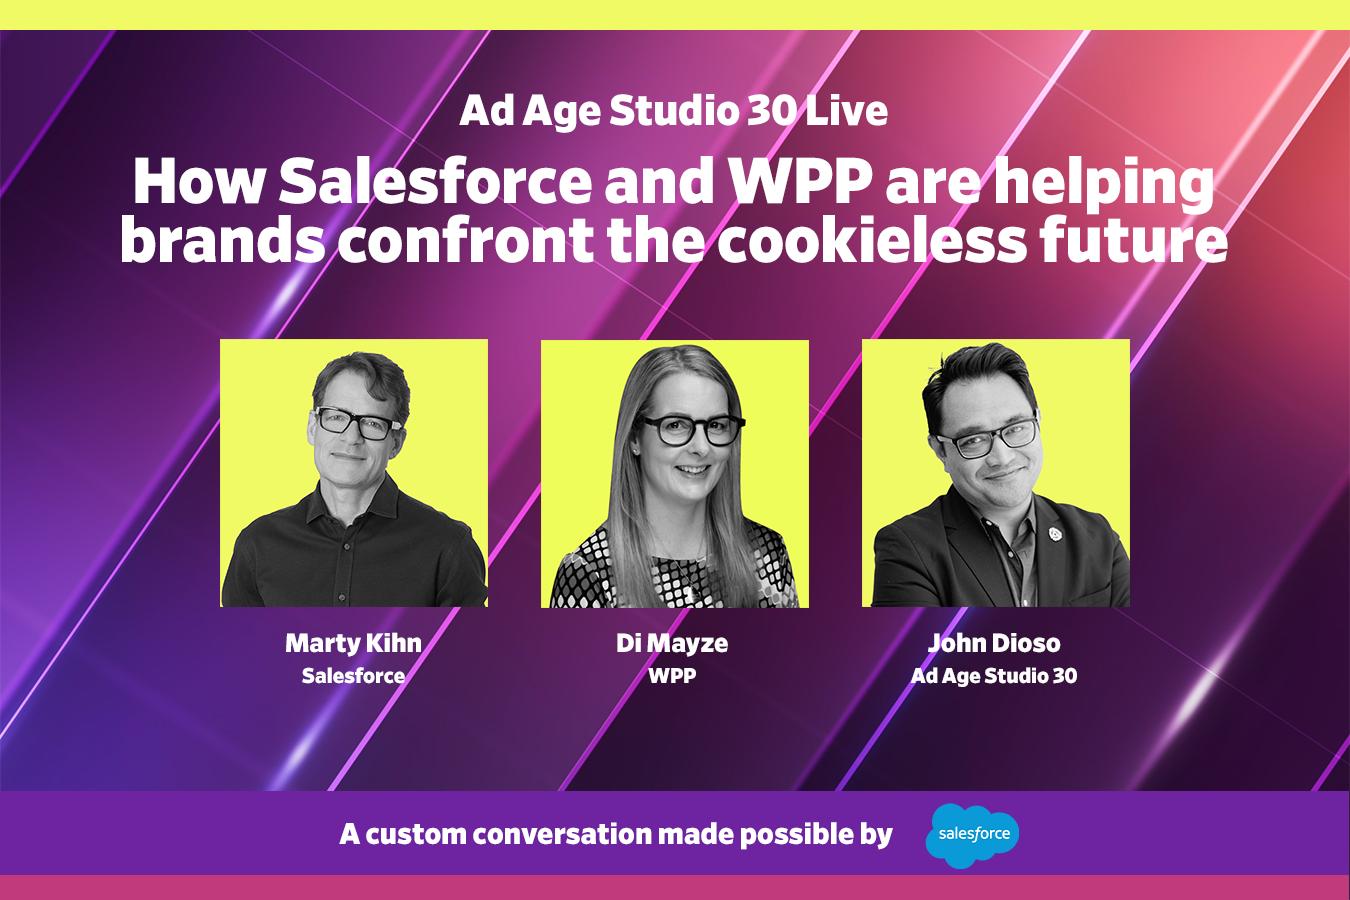 aas30live_20211019_3x2-Salesforce.png